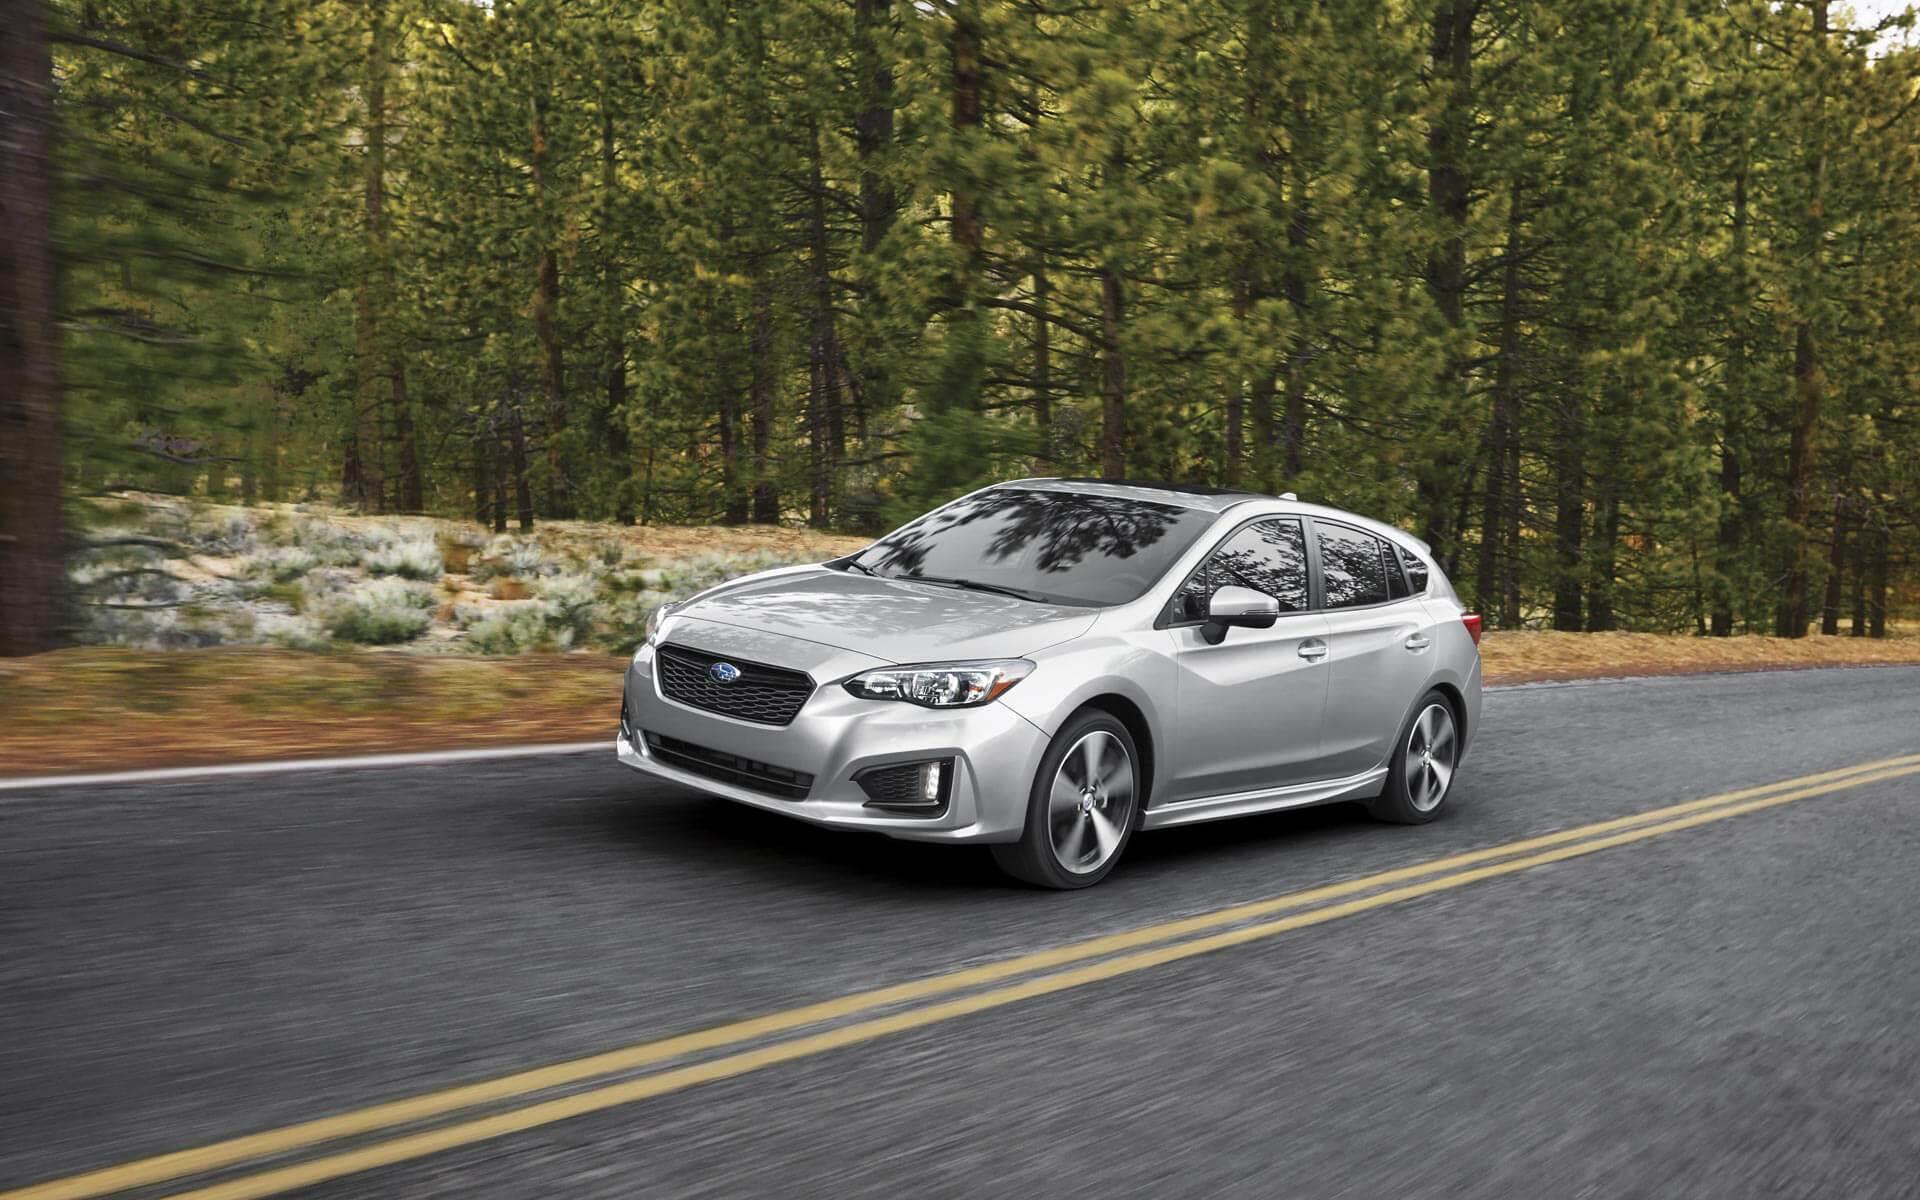 Subaru Impreza Lease Offers Finance Specials Greeley Co